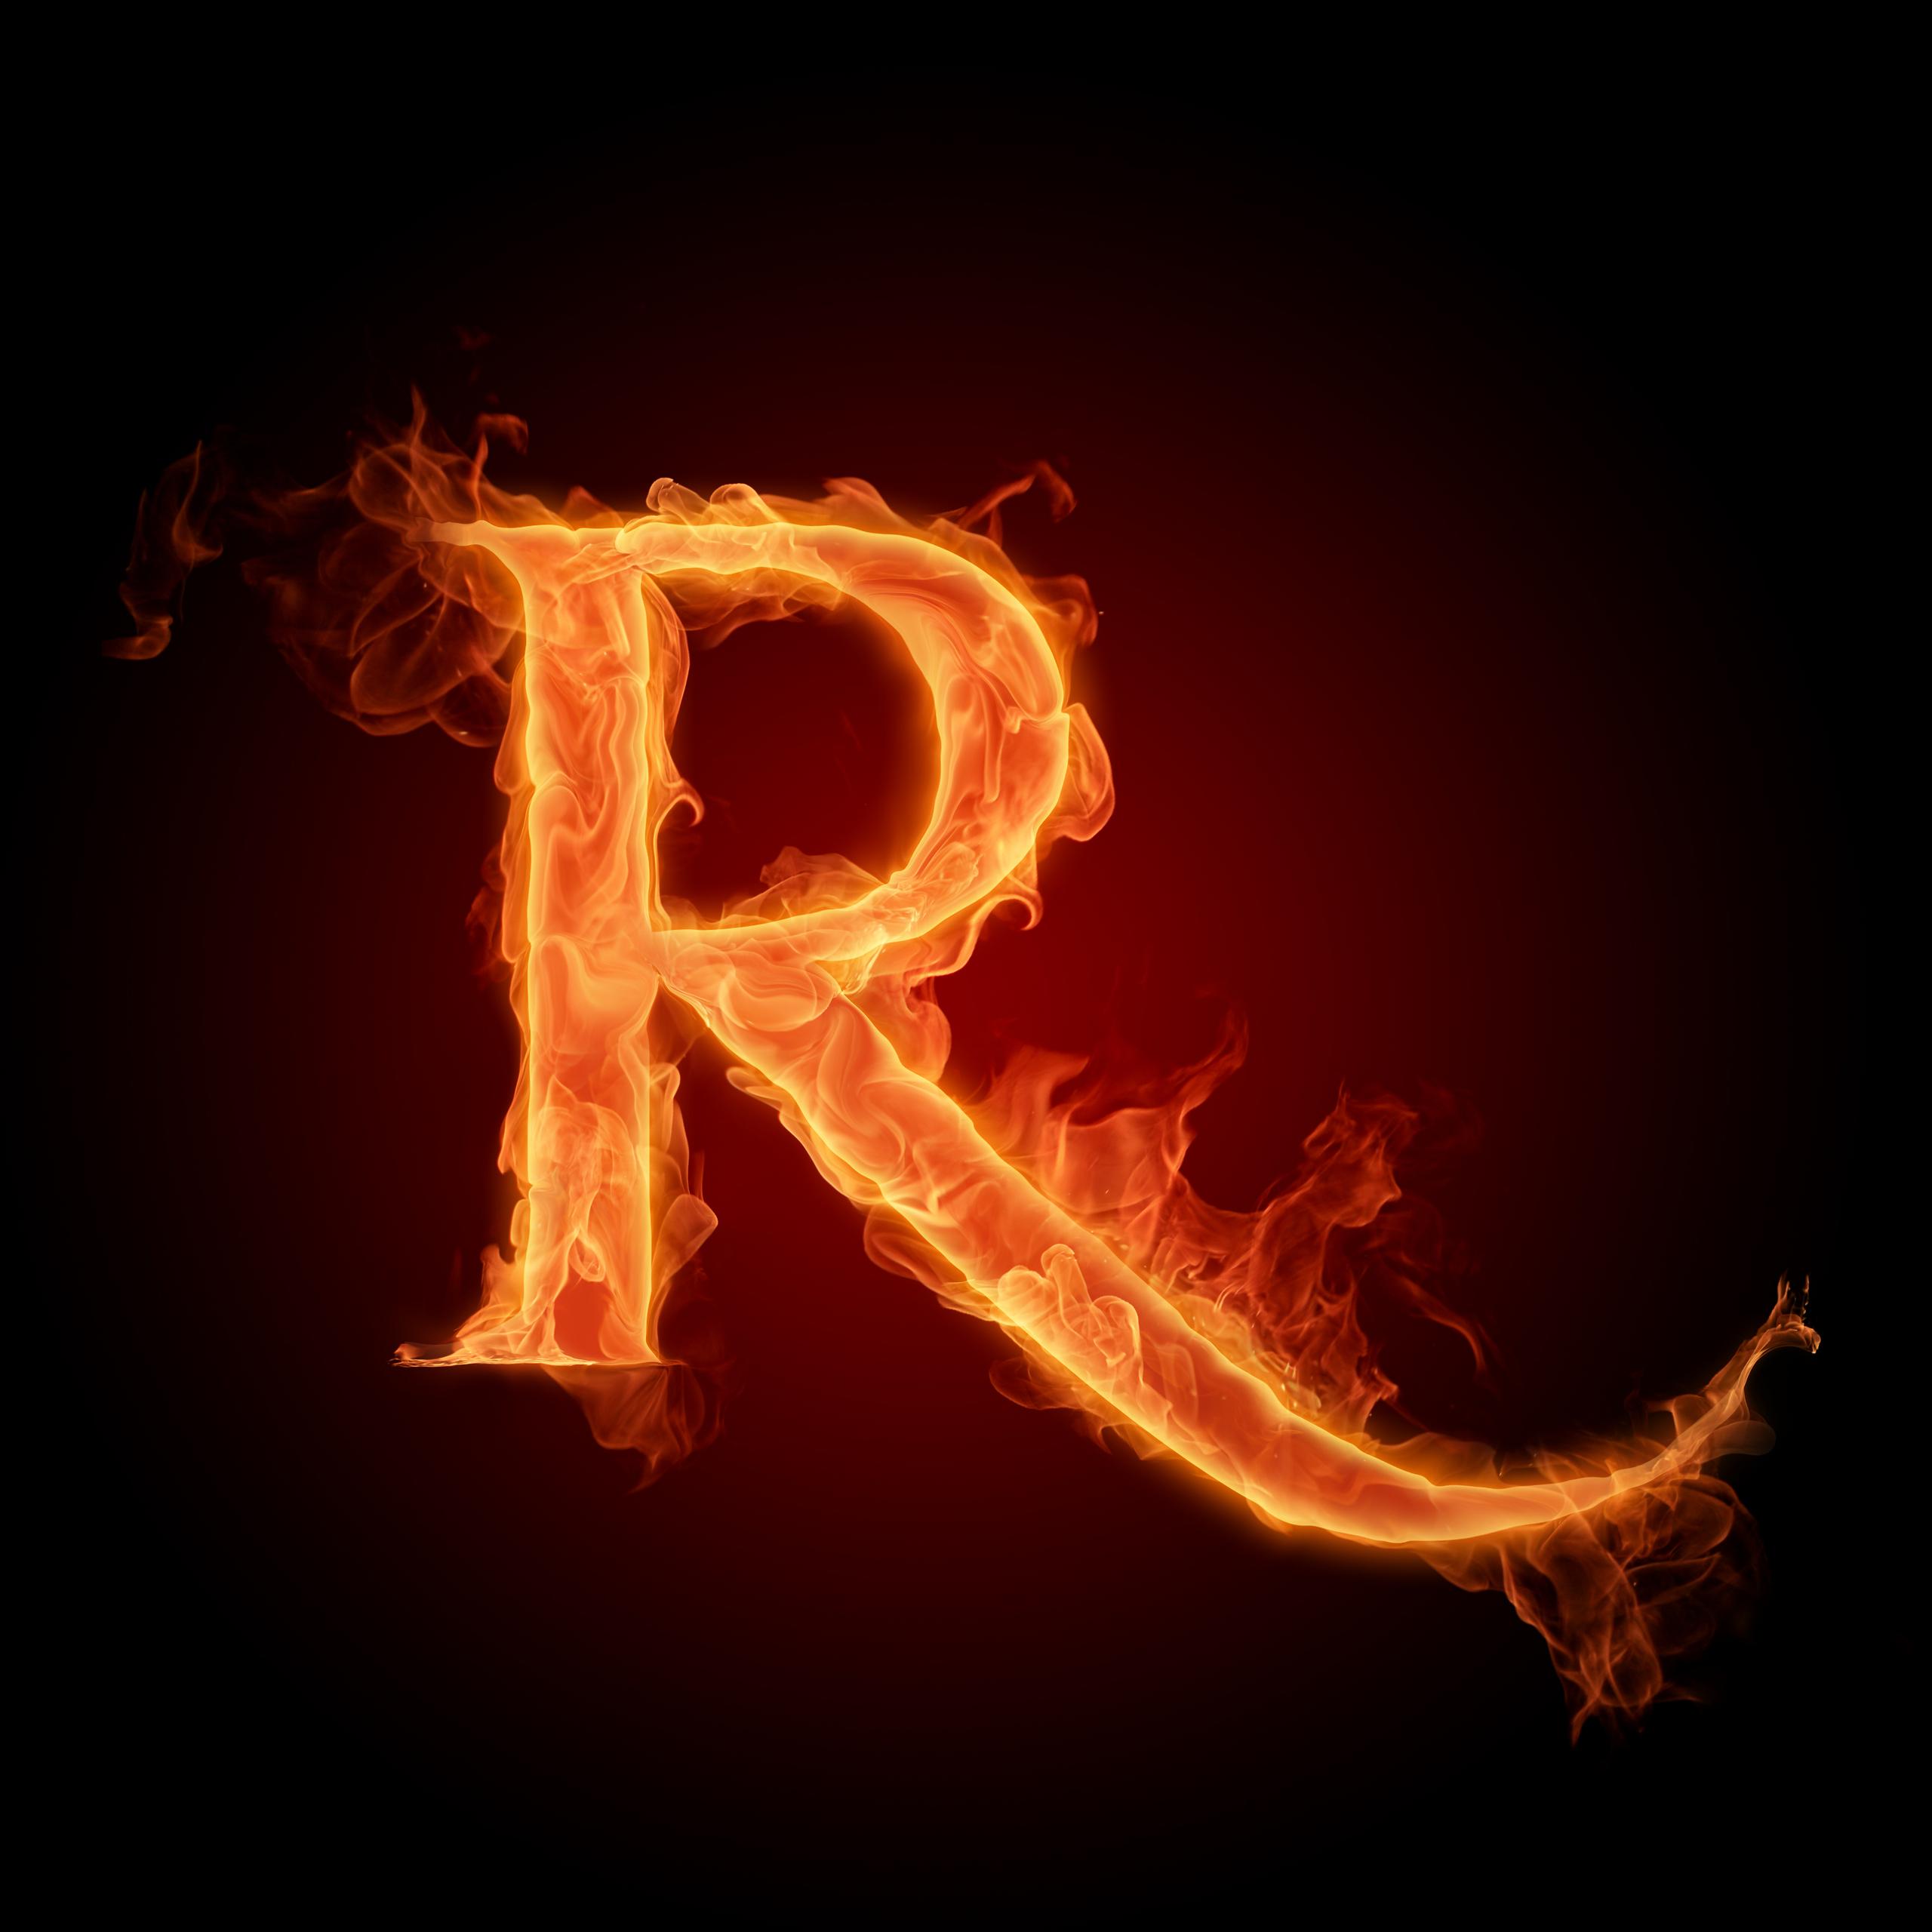 image letter r - photo #34